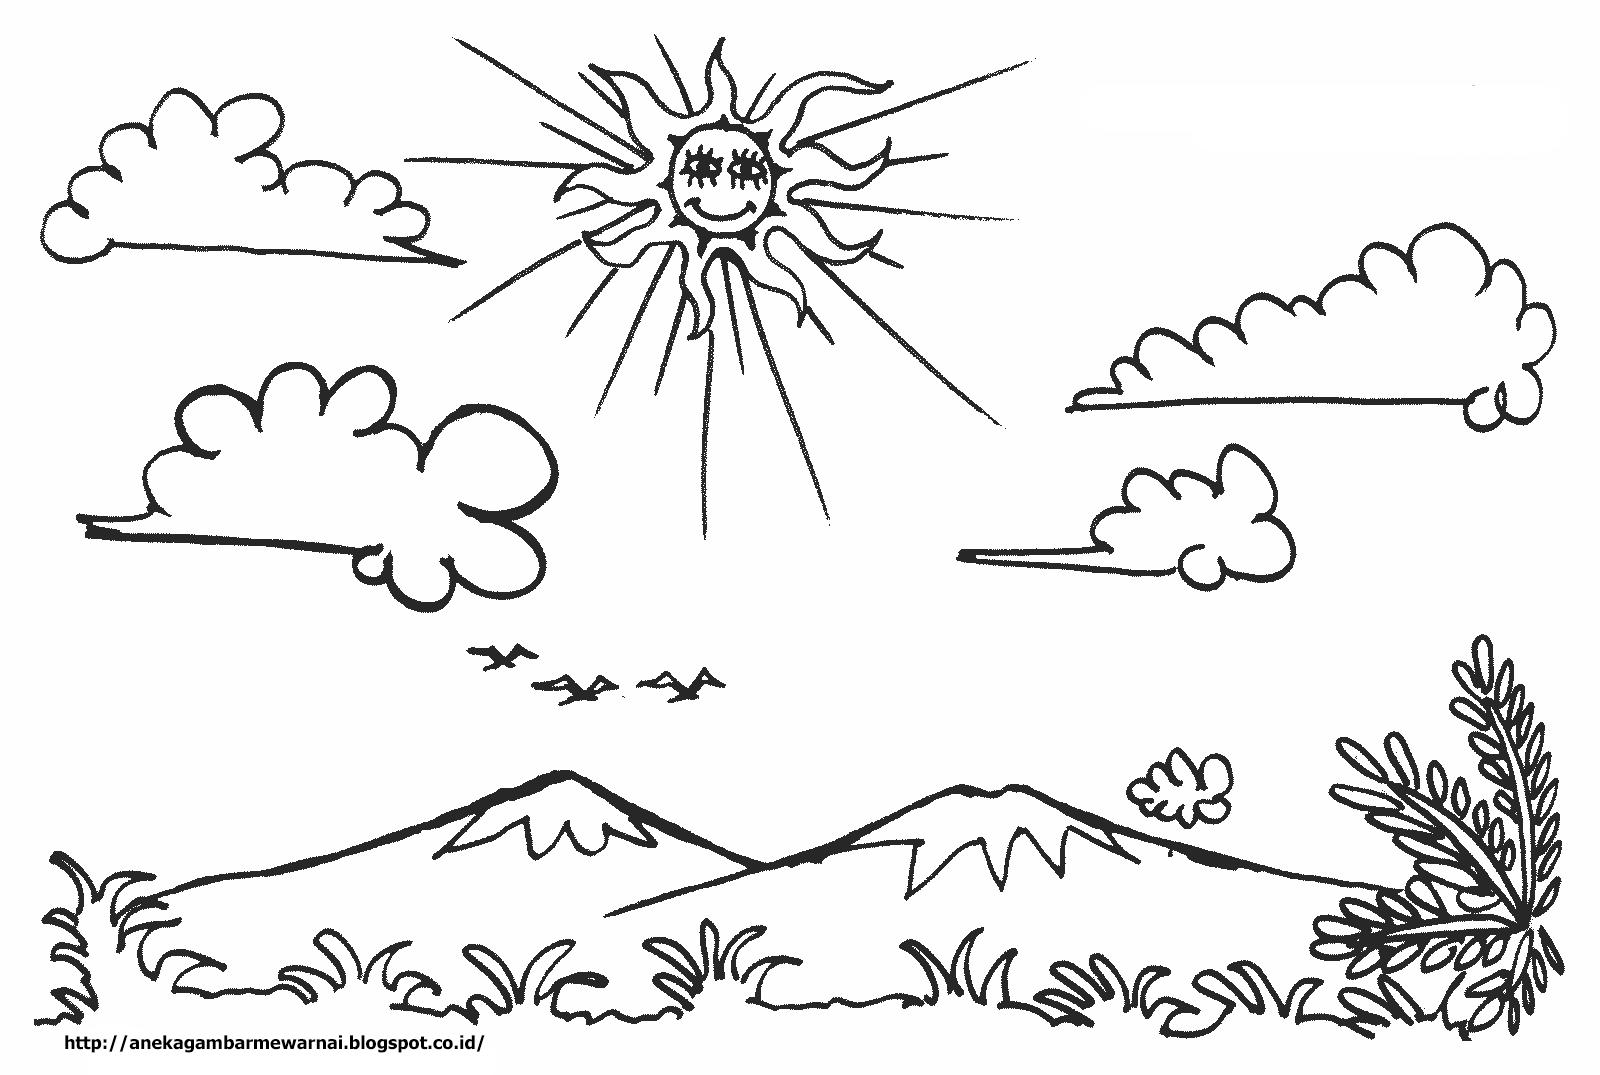 Aneka Gambar Mewarnai Gambar Mewarnai Pemandangan Langit Cerah Untuk Anak PAUD dan TK Pelajaran